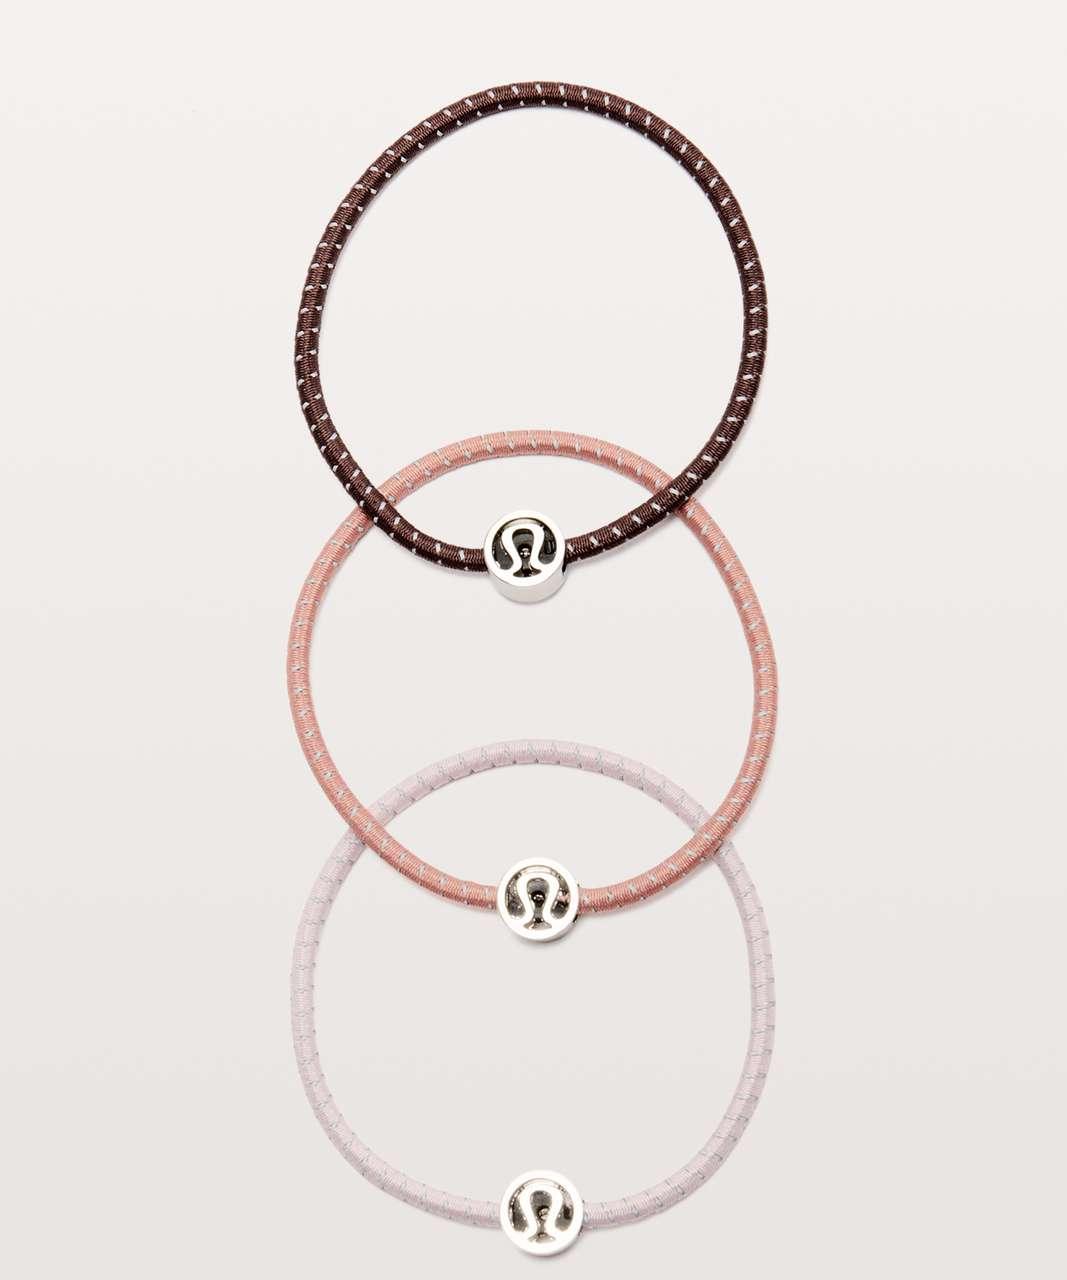 Lululemon Glow On Hair Ties - Antique Bark / Porcelain Pink / Misty Rose